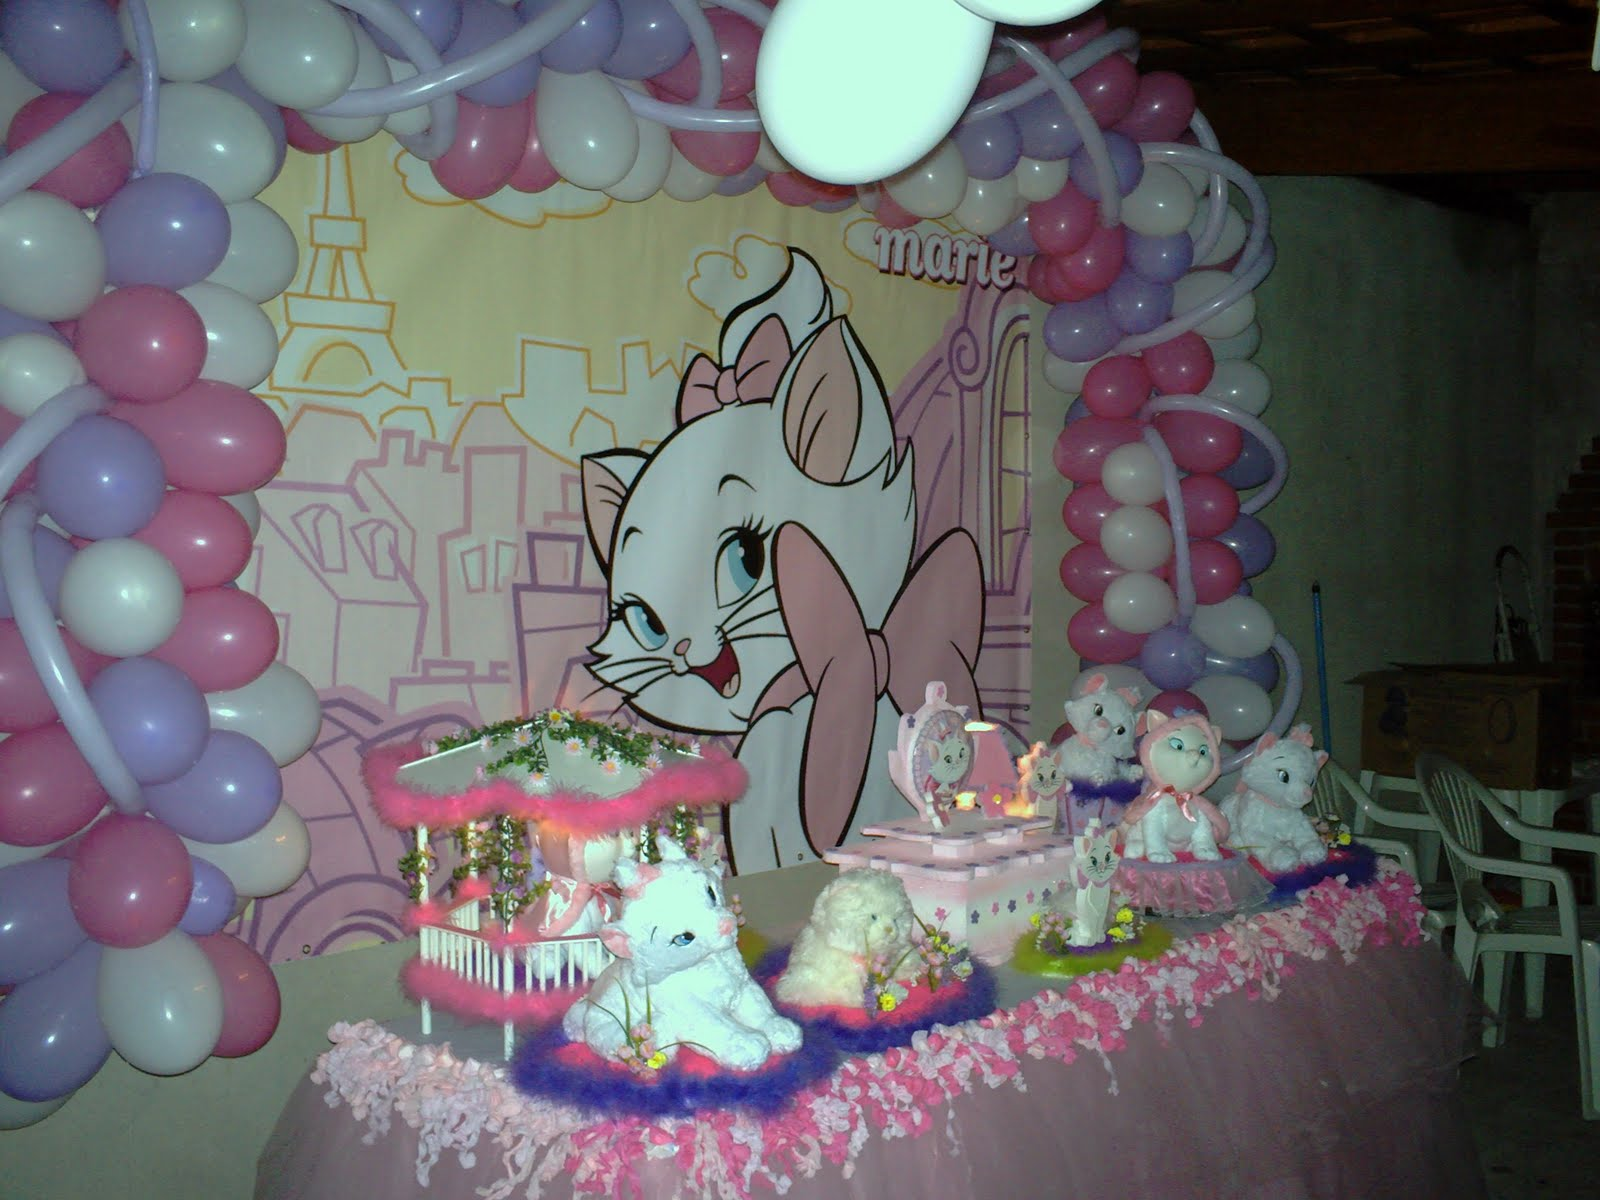 Da Festa De Aniversario Da Filhota Yasmin De Sete Anos O Tema